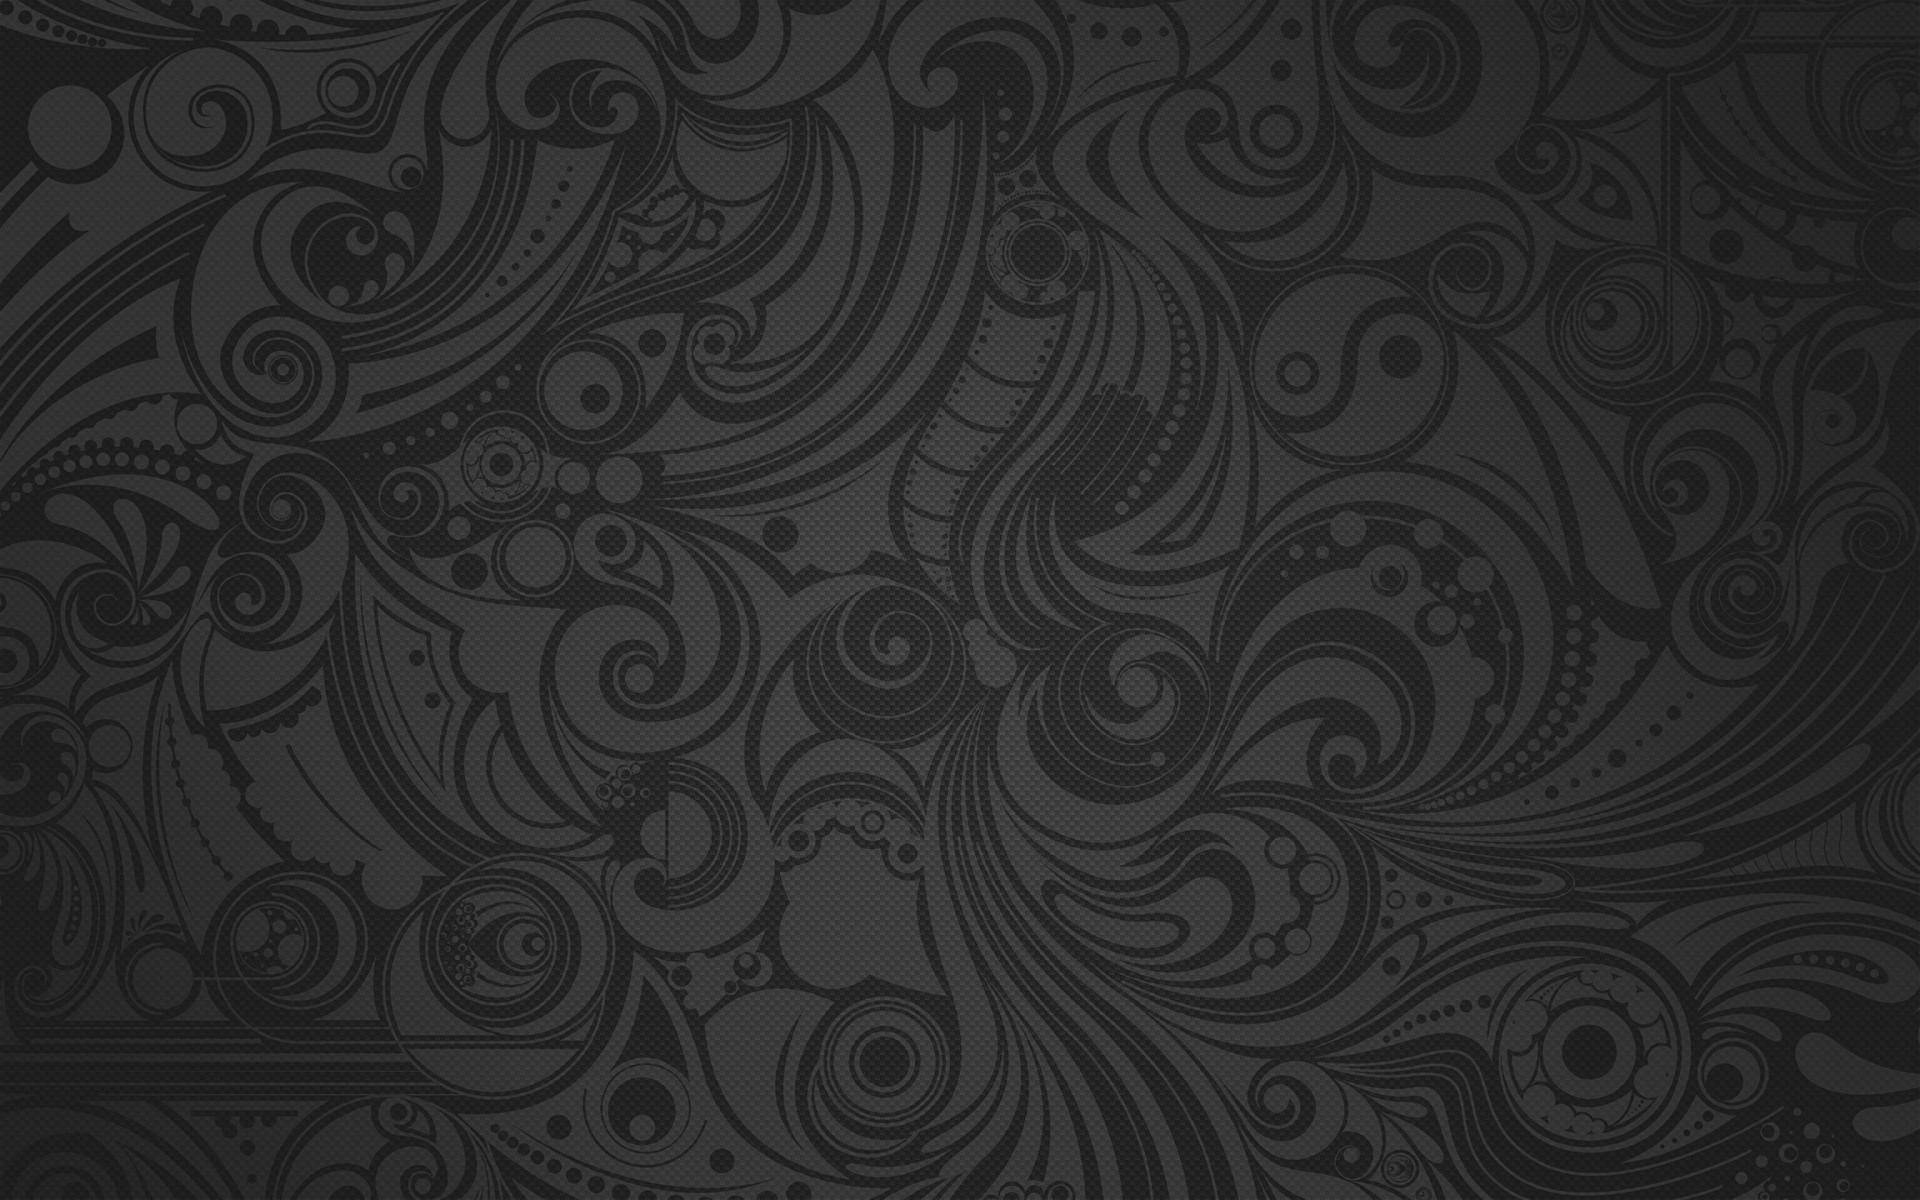 Artistic Computer Wallpapers, Desktop Backgrounds